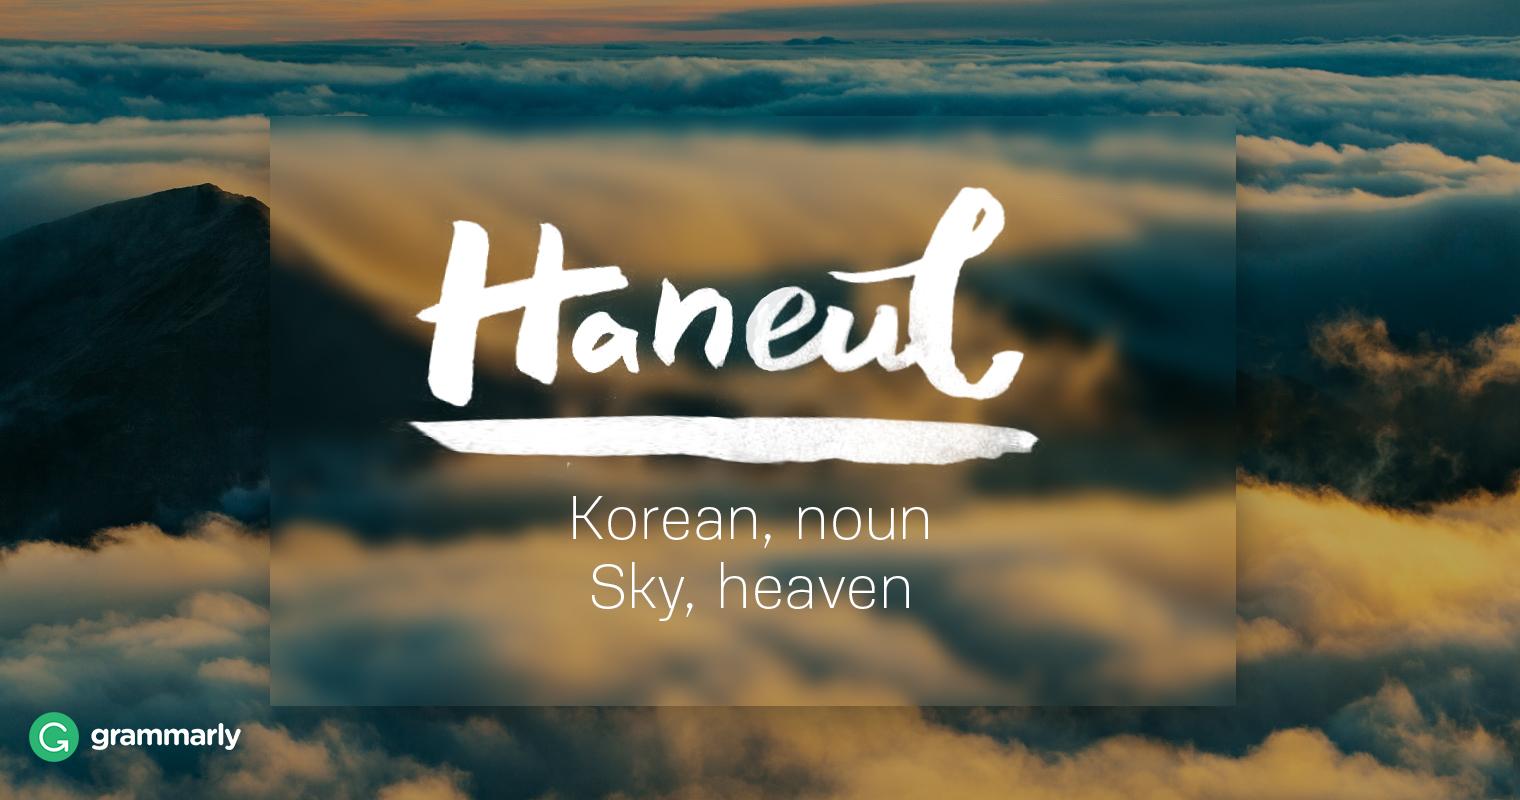 Haneul Definition